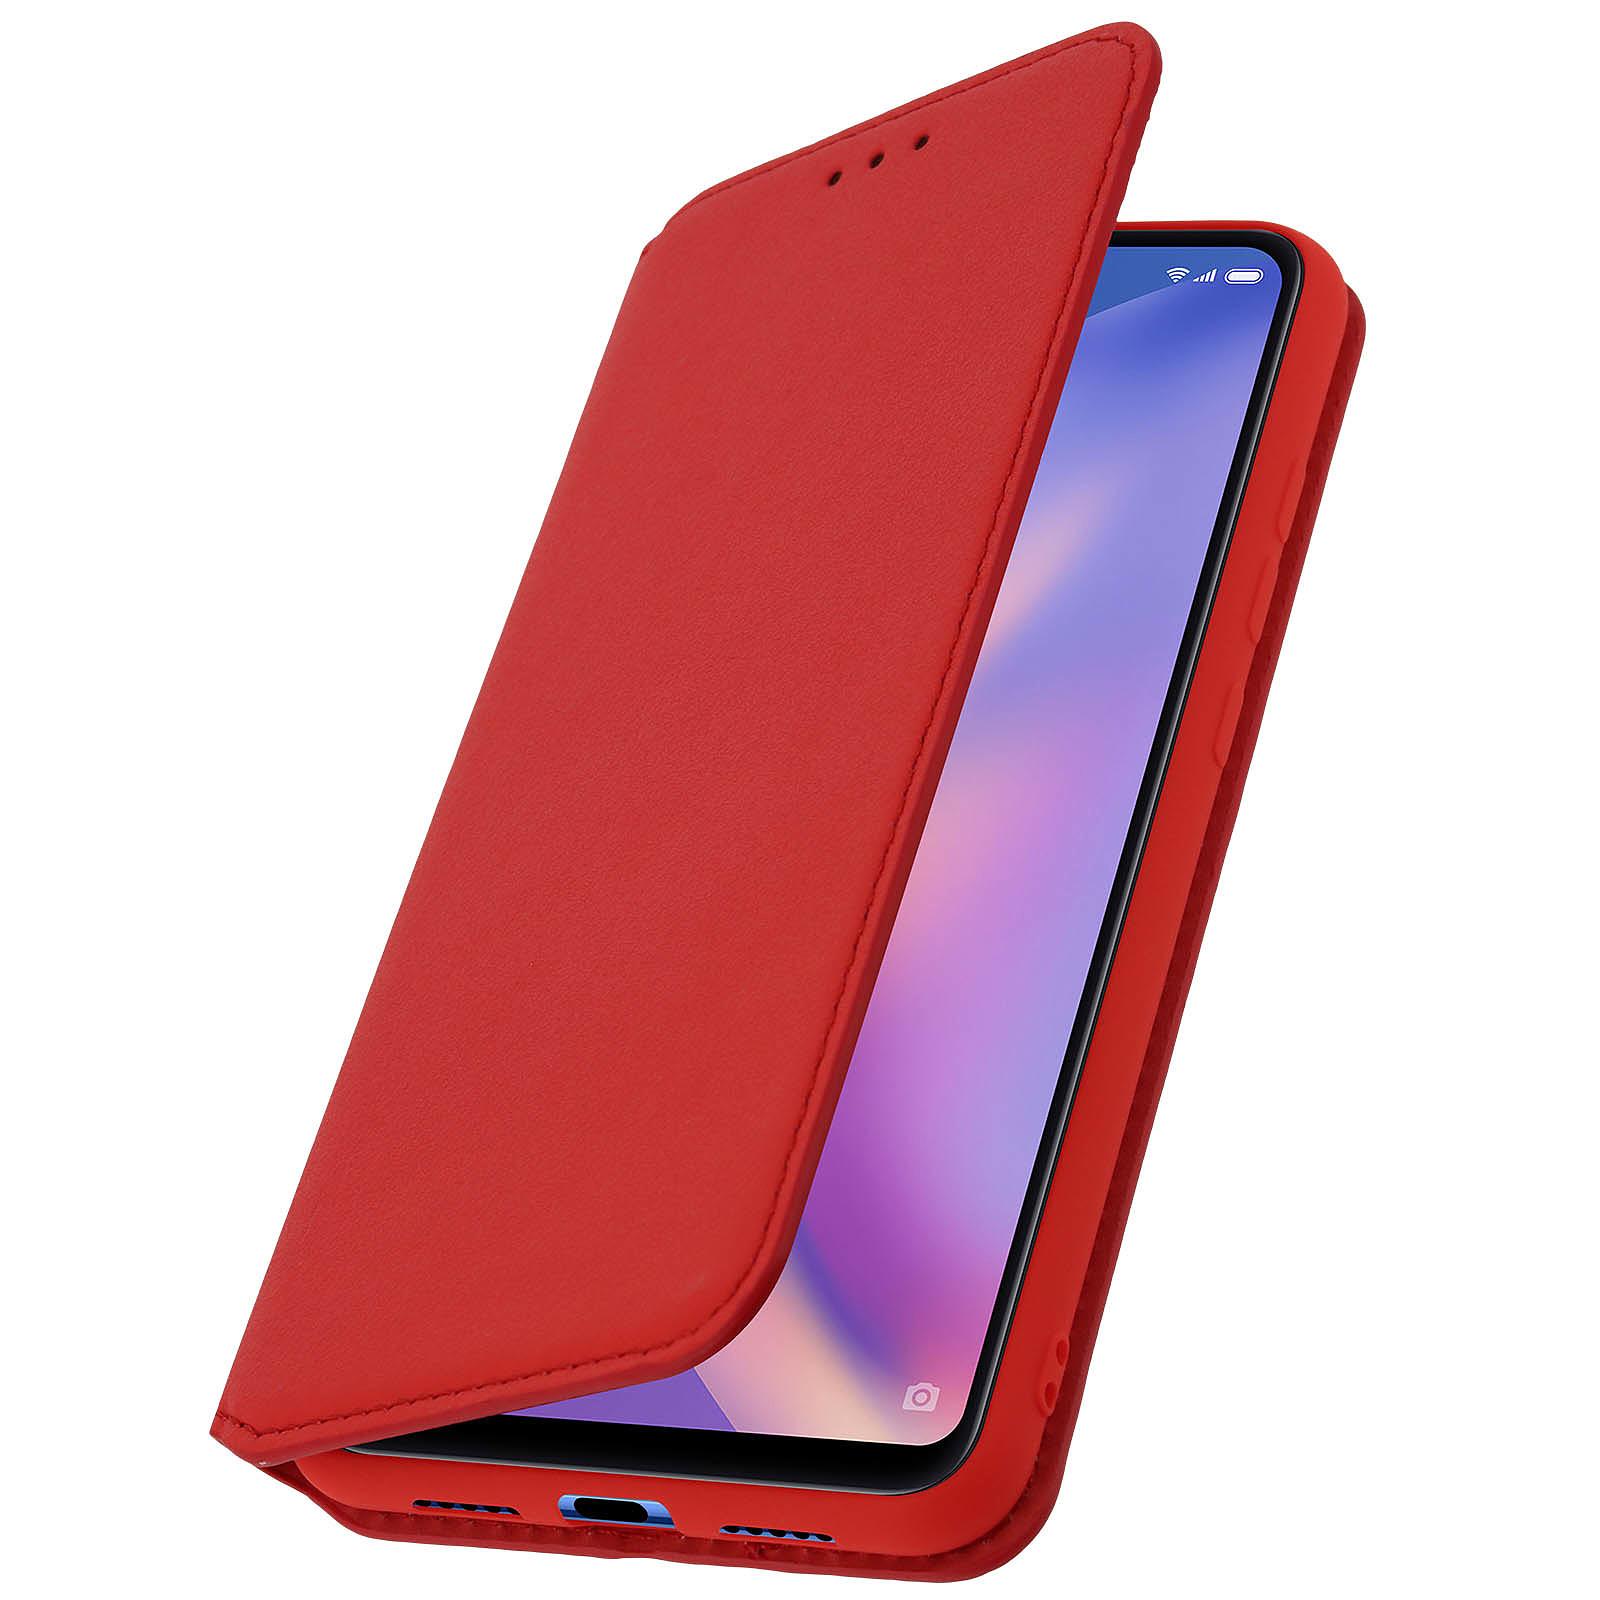 Avizar Etui folio Rouge Éco-cuir pour Xiaomi Mi 8 Lite